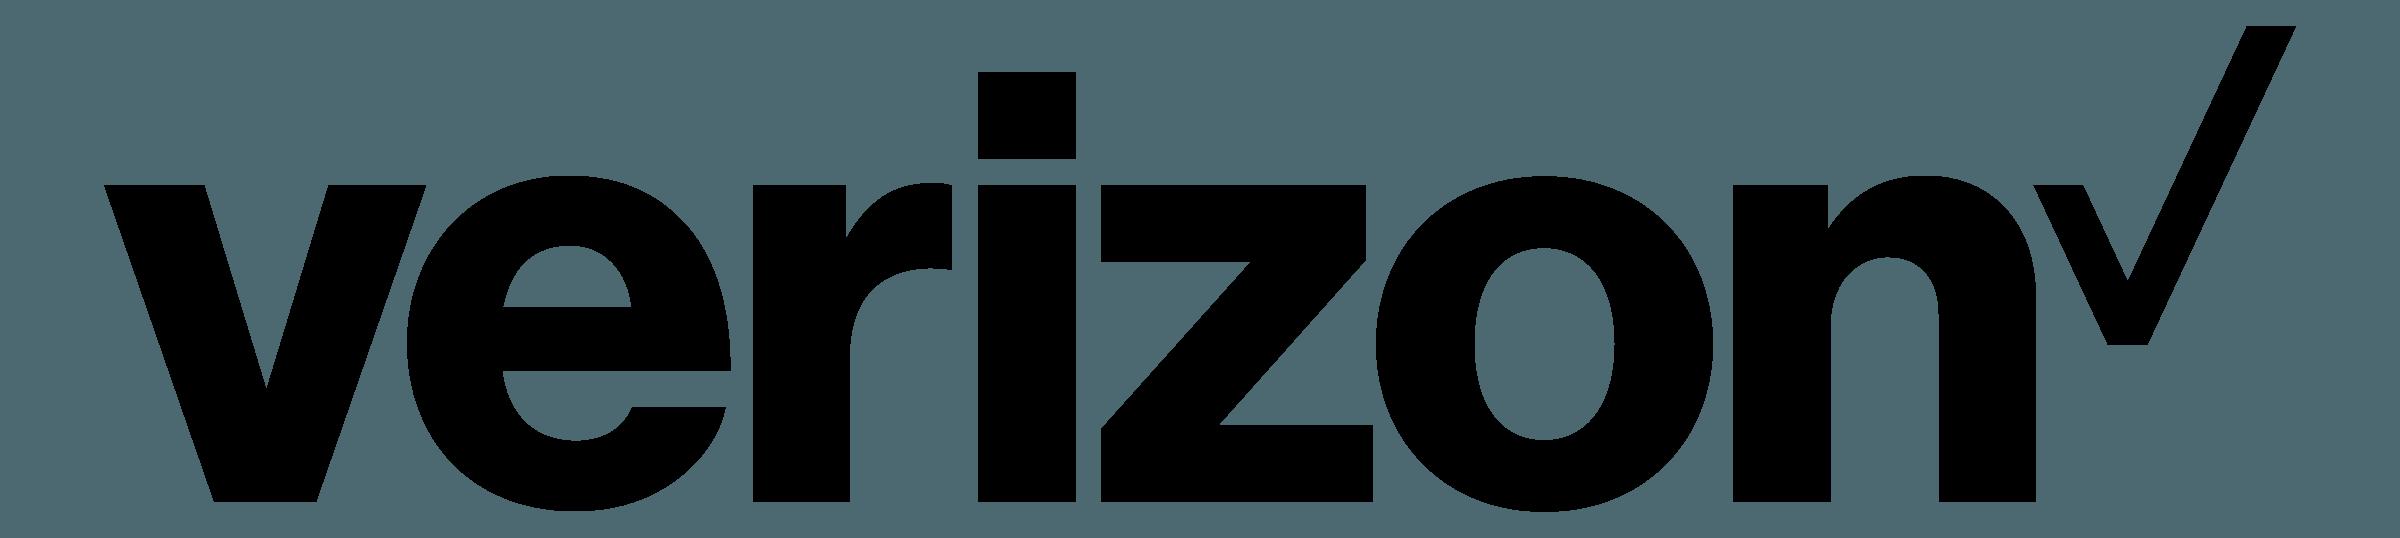 Verizon Logo PNG Transparent & SVG Vector - Freebie Supply